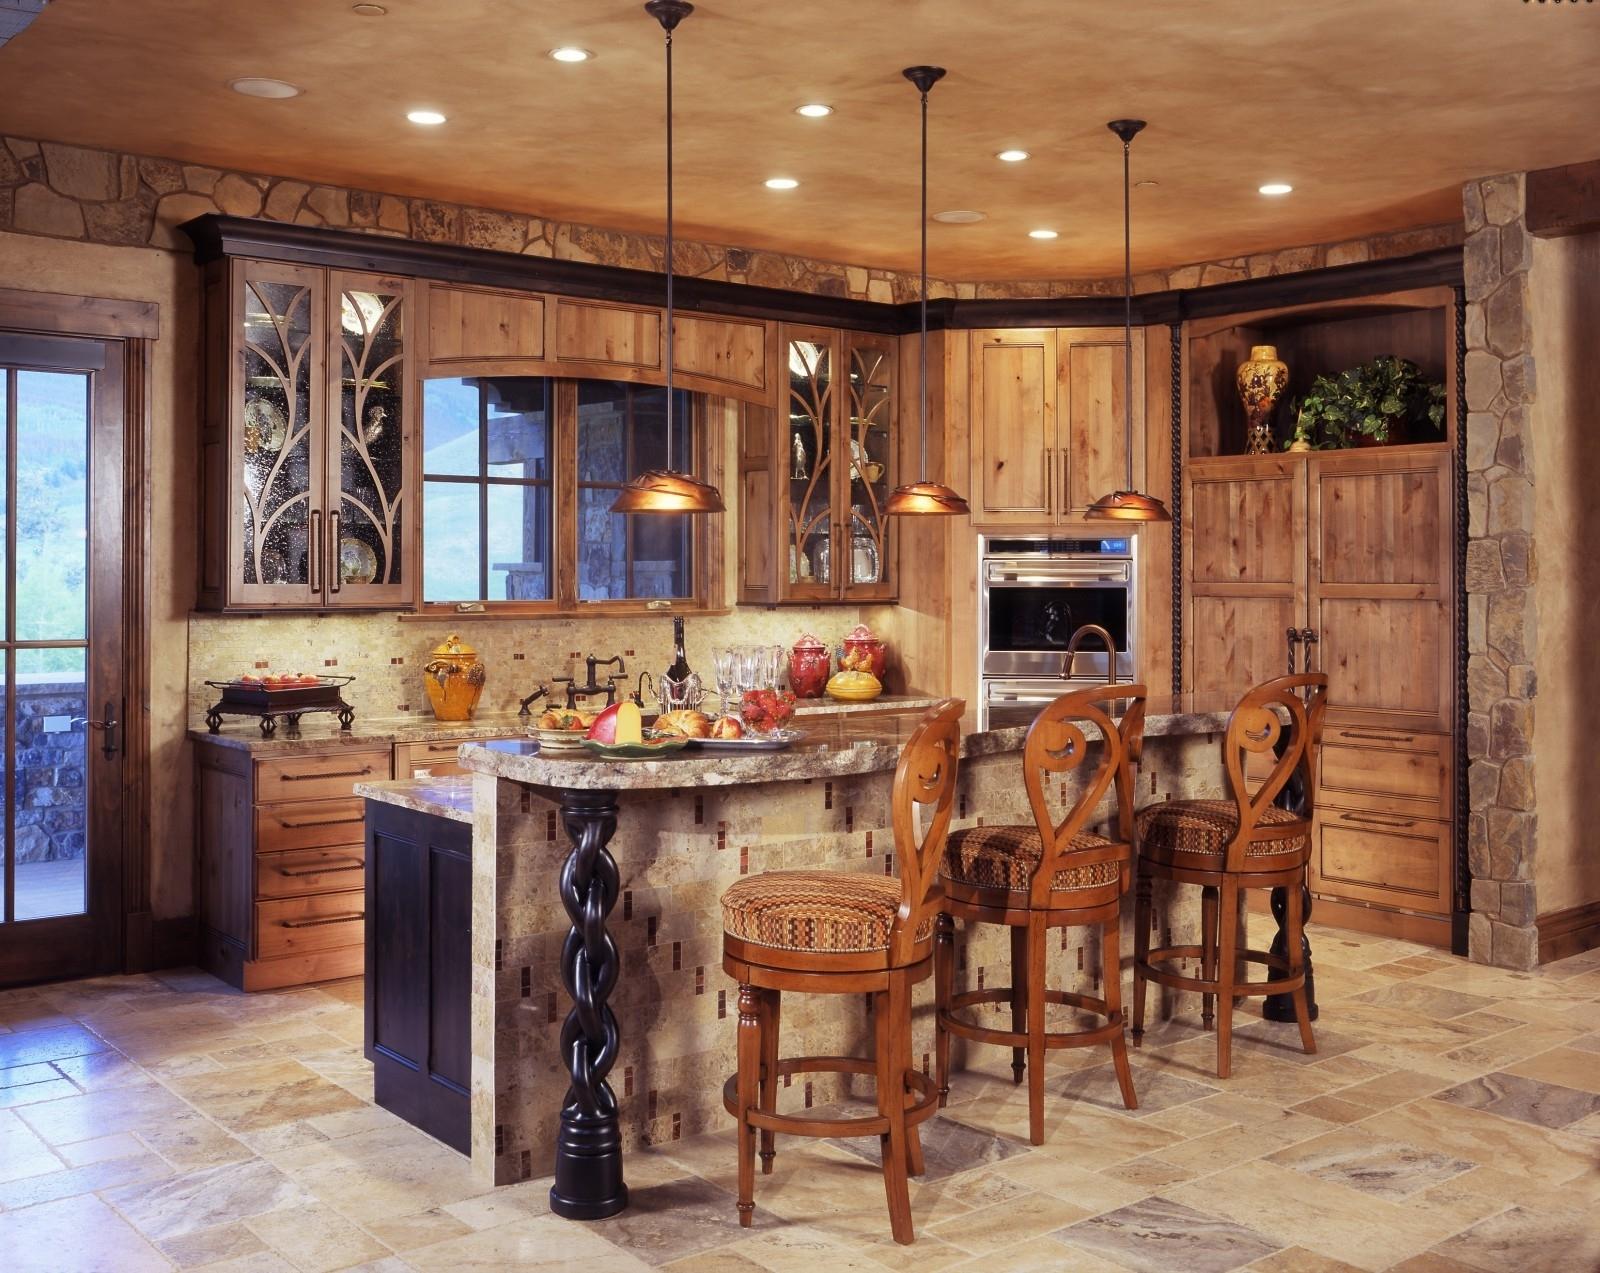 Latest Rustic Kitchen Lighting Ideas – Kitchen Ideas, Rustic Kitchen Within Small Rustic Kitchen Chandeliers (View 7 of 15)